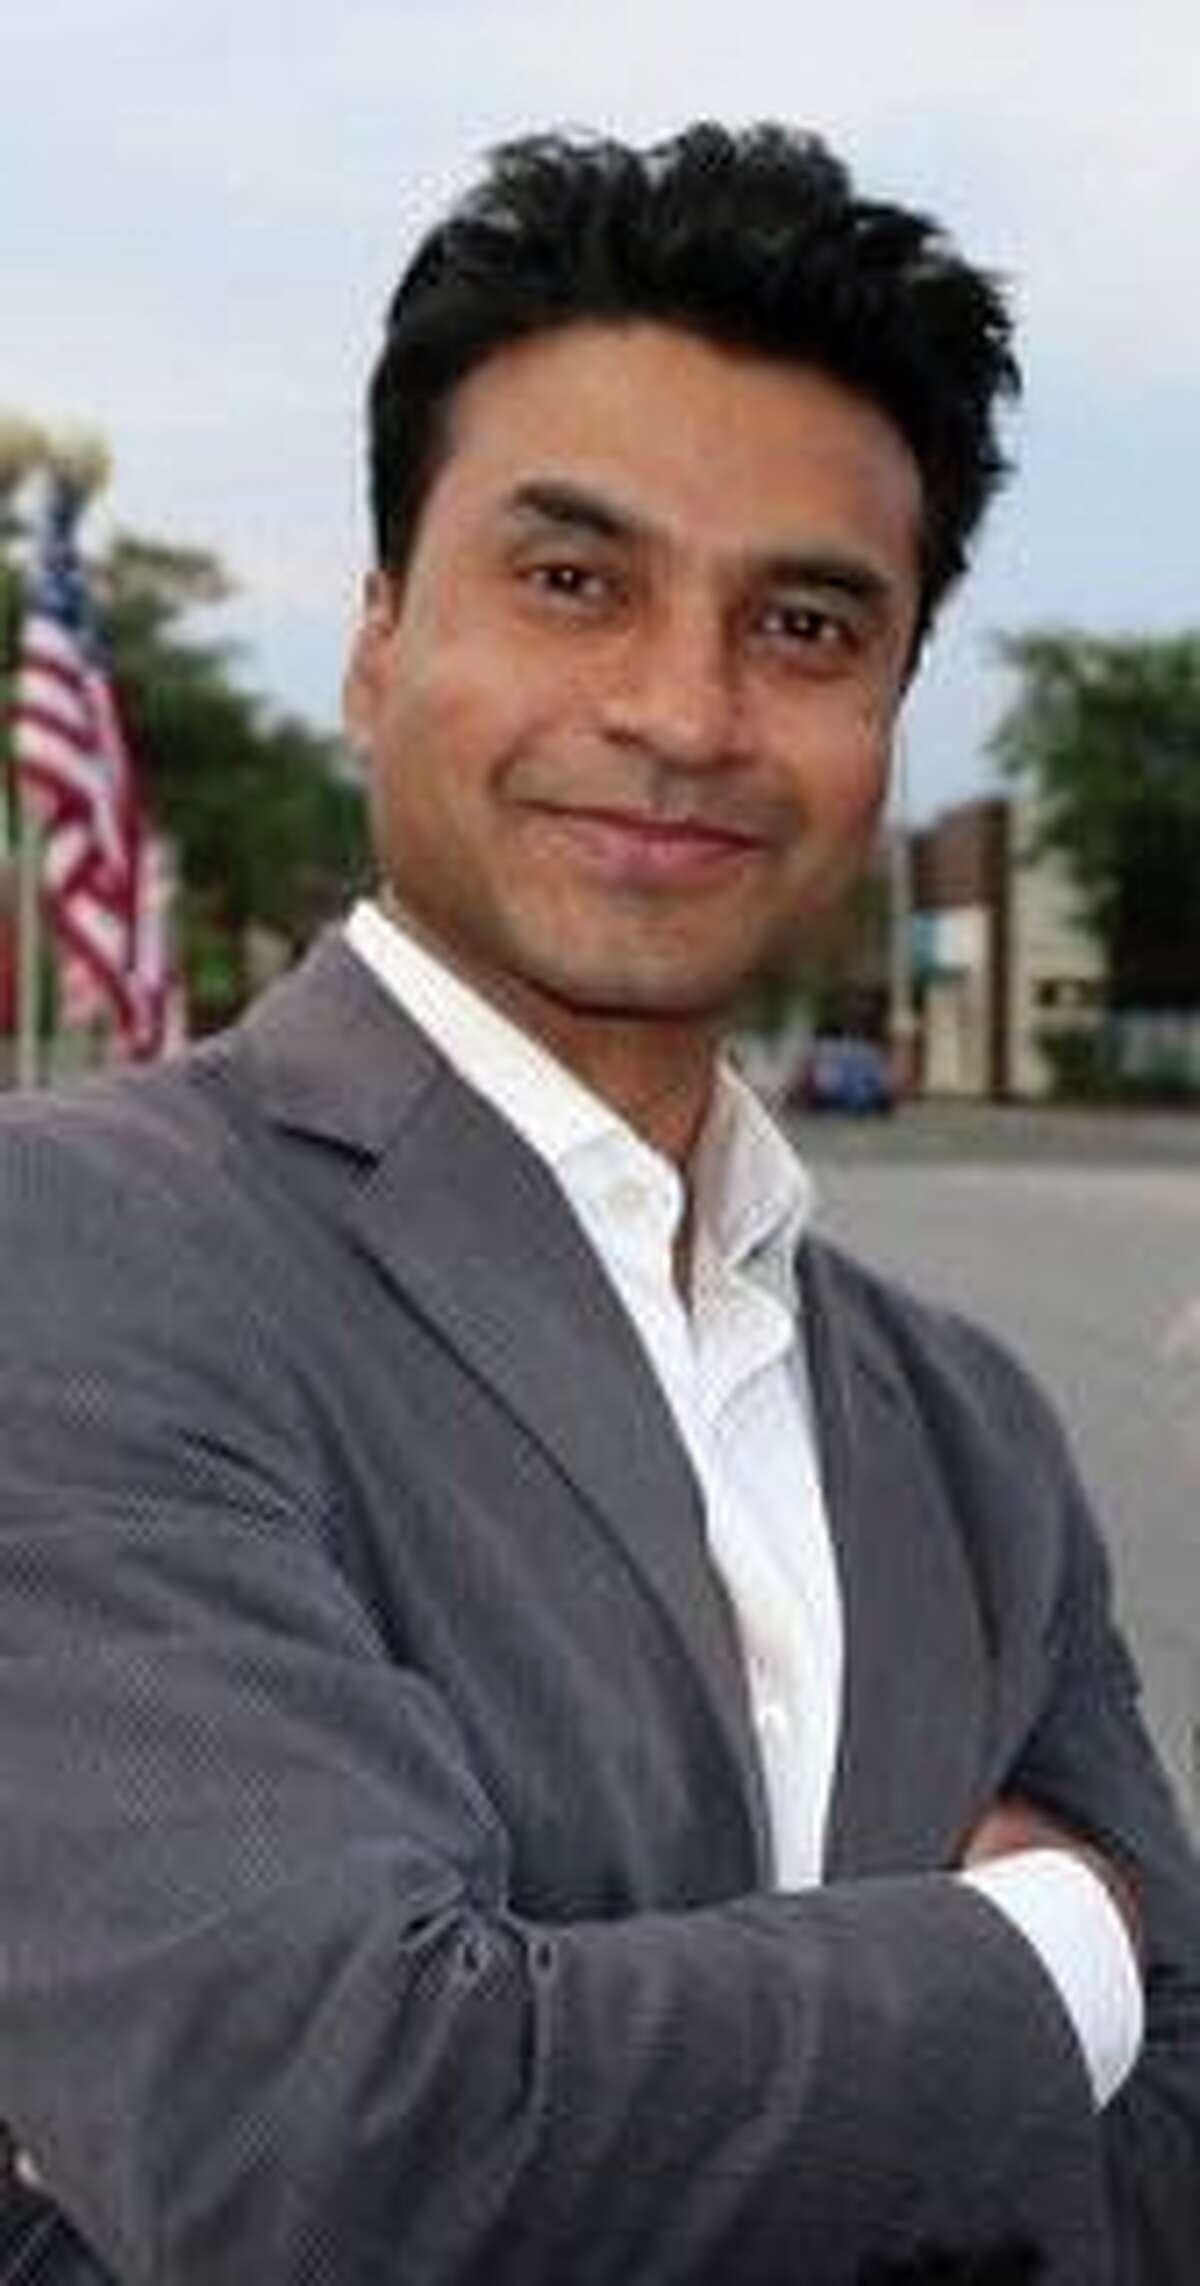 Republican BOE candidate Vik Muktavaram.